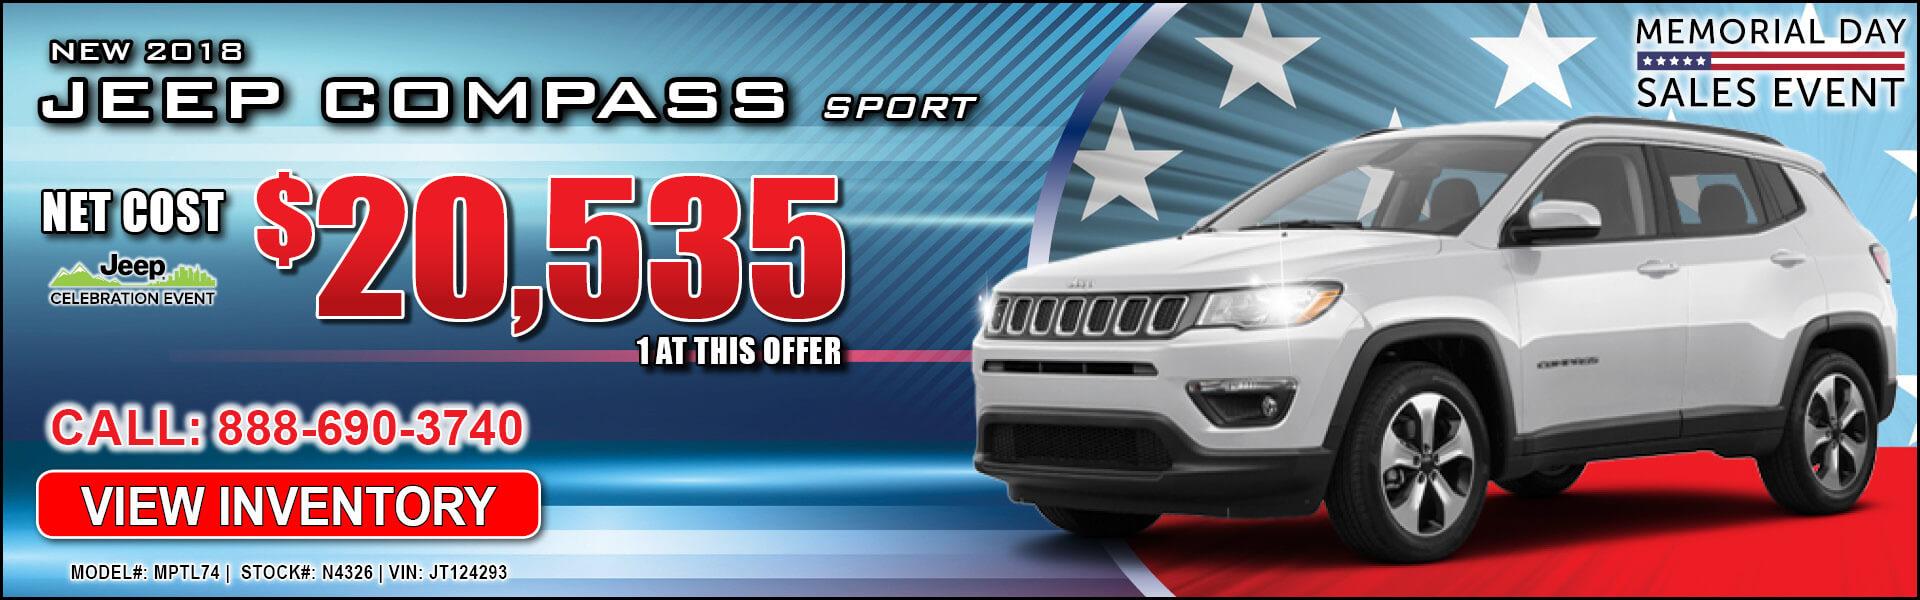 Jeep Compass $20,535